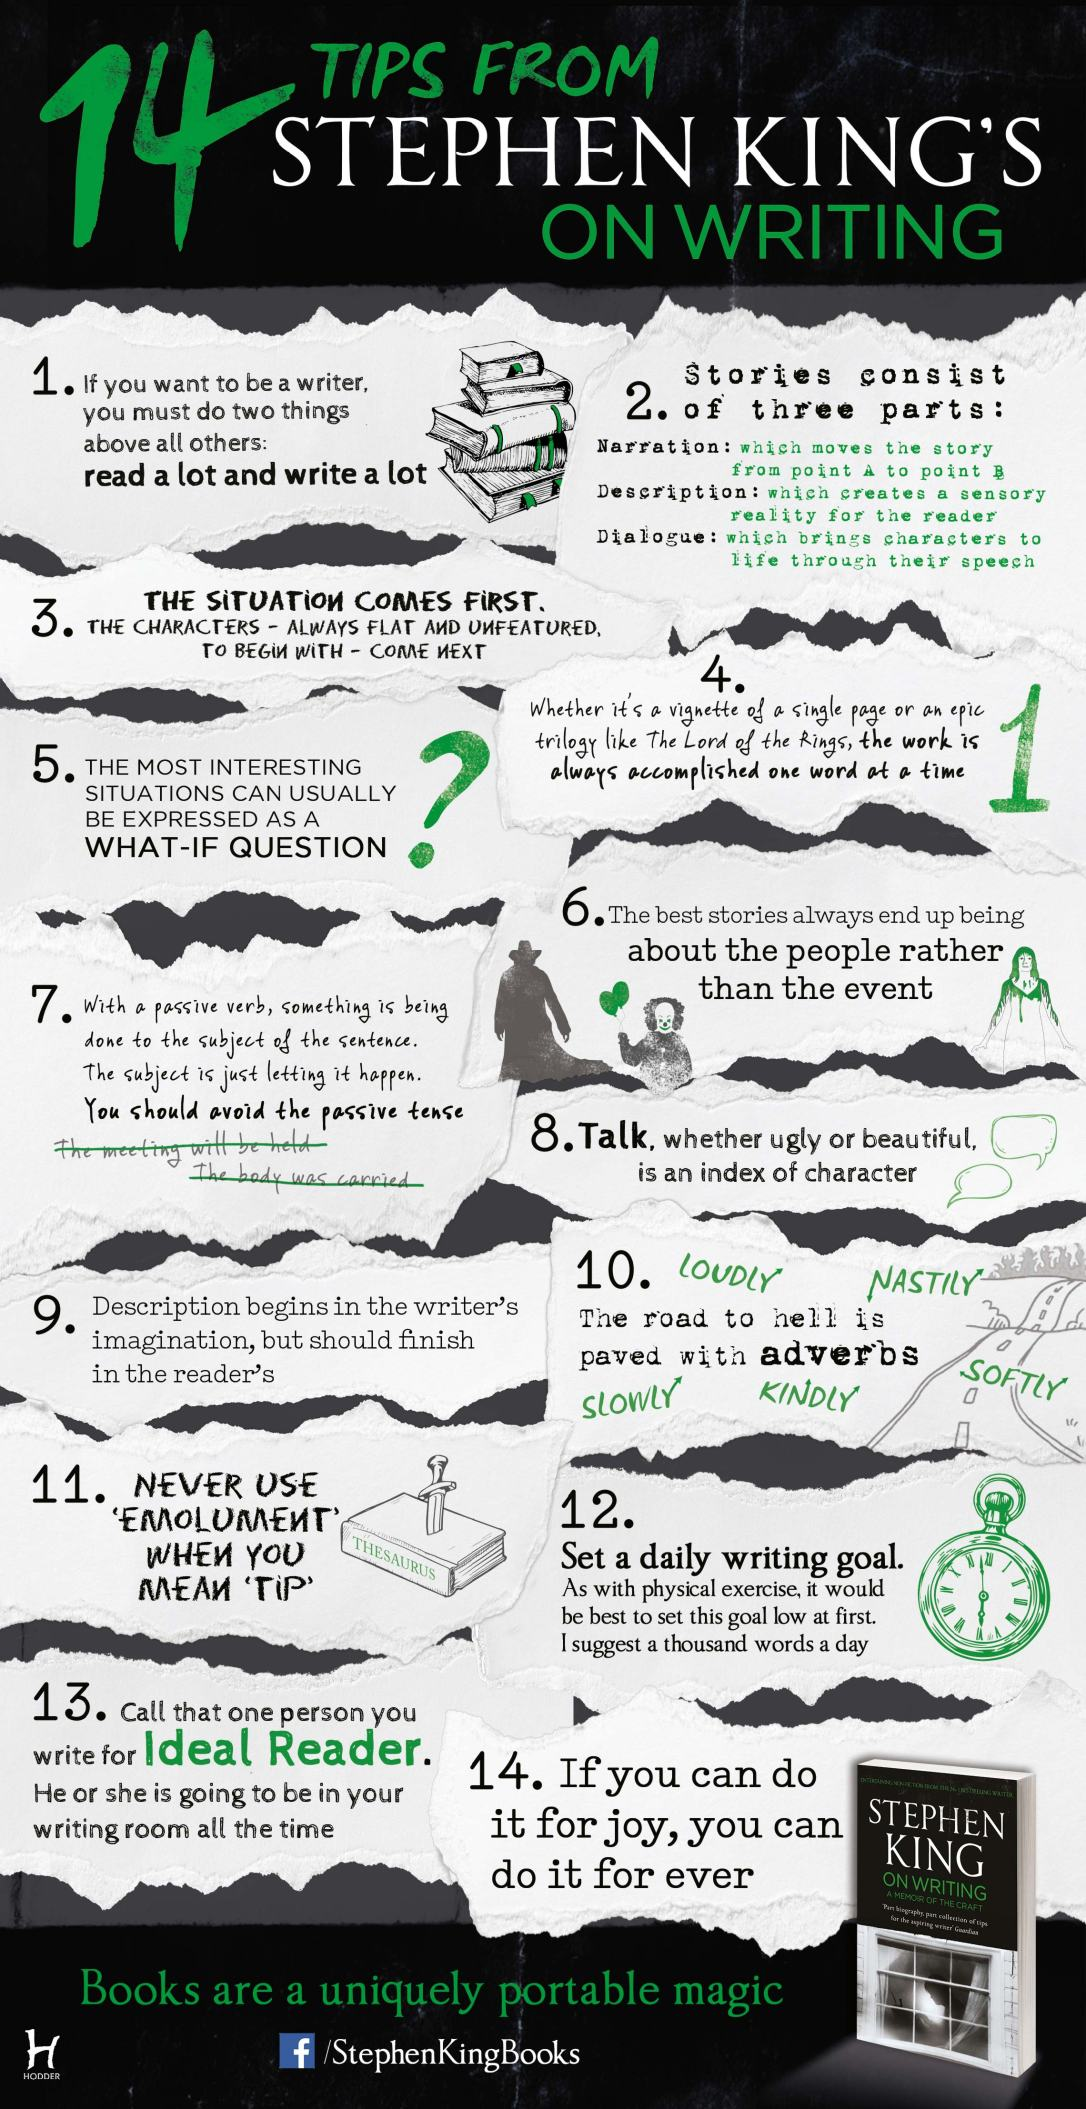 StephenKing_Infographic.jpg